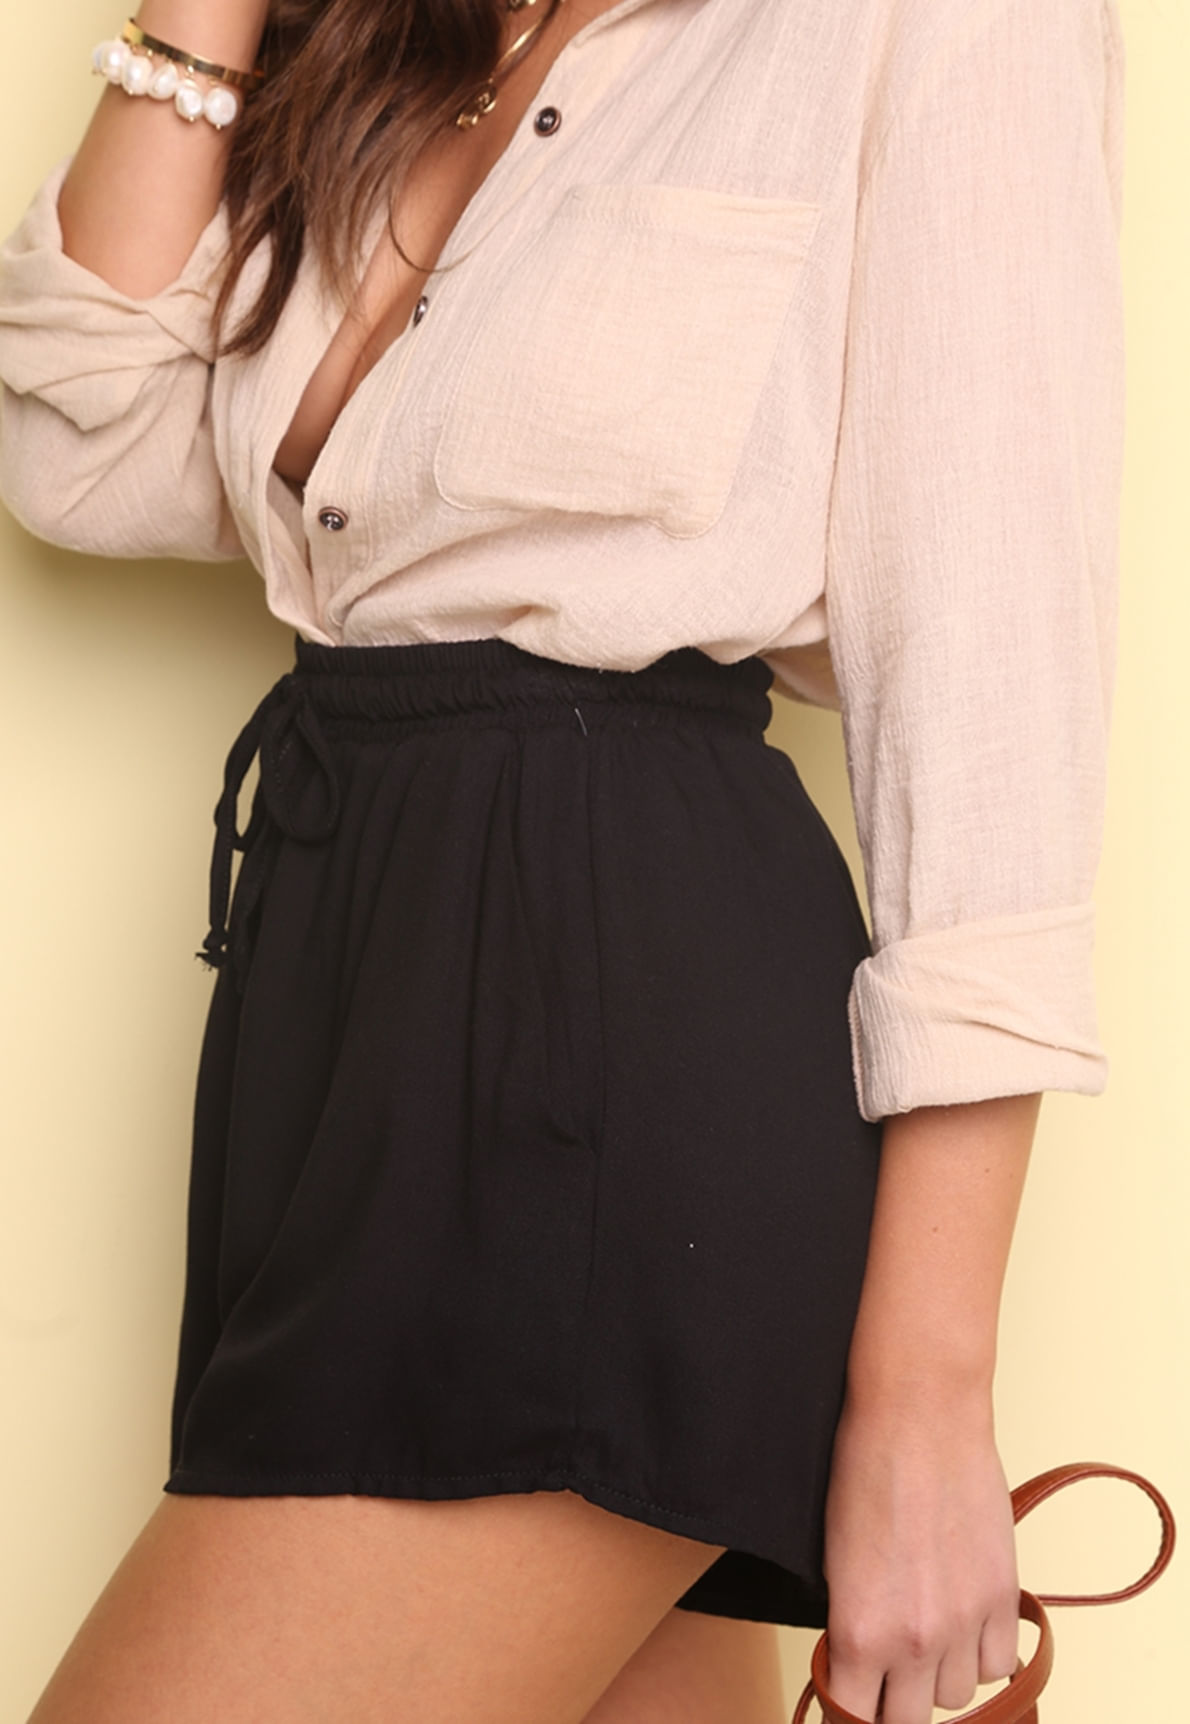 29337-shorts-preto-soltinho-caterina-mundo-lolita-03